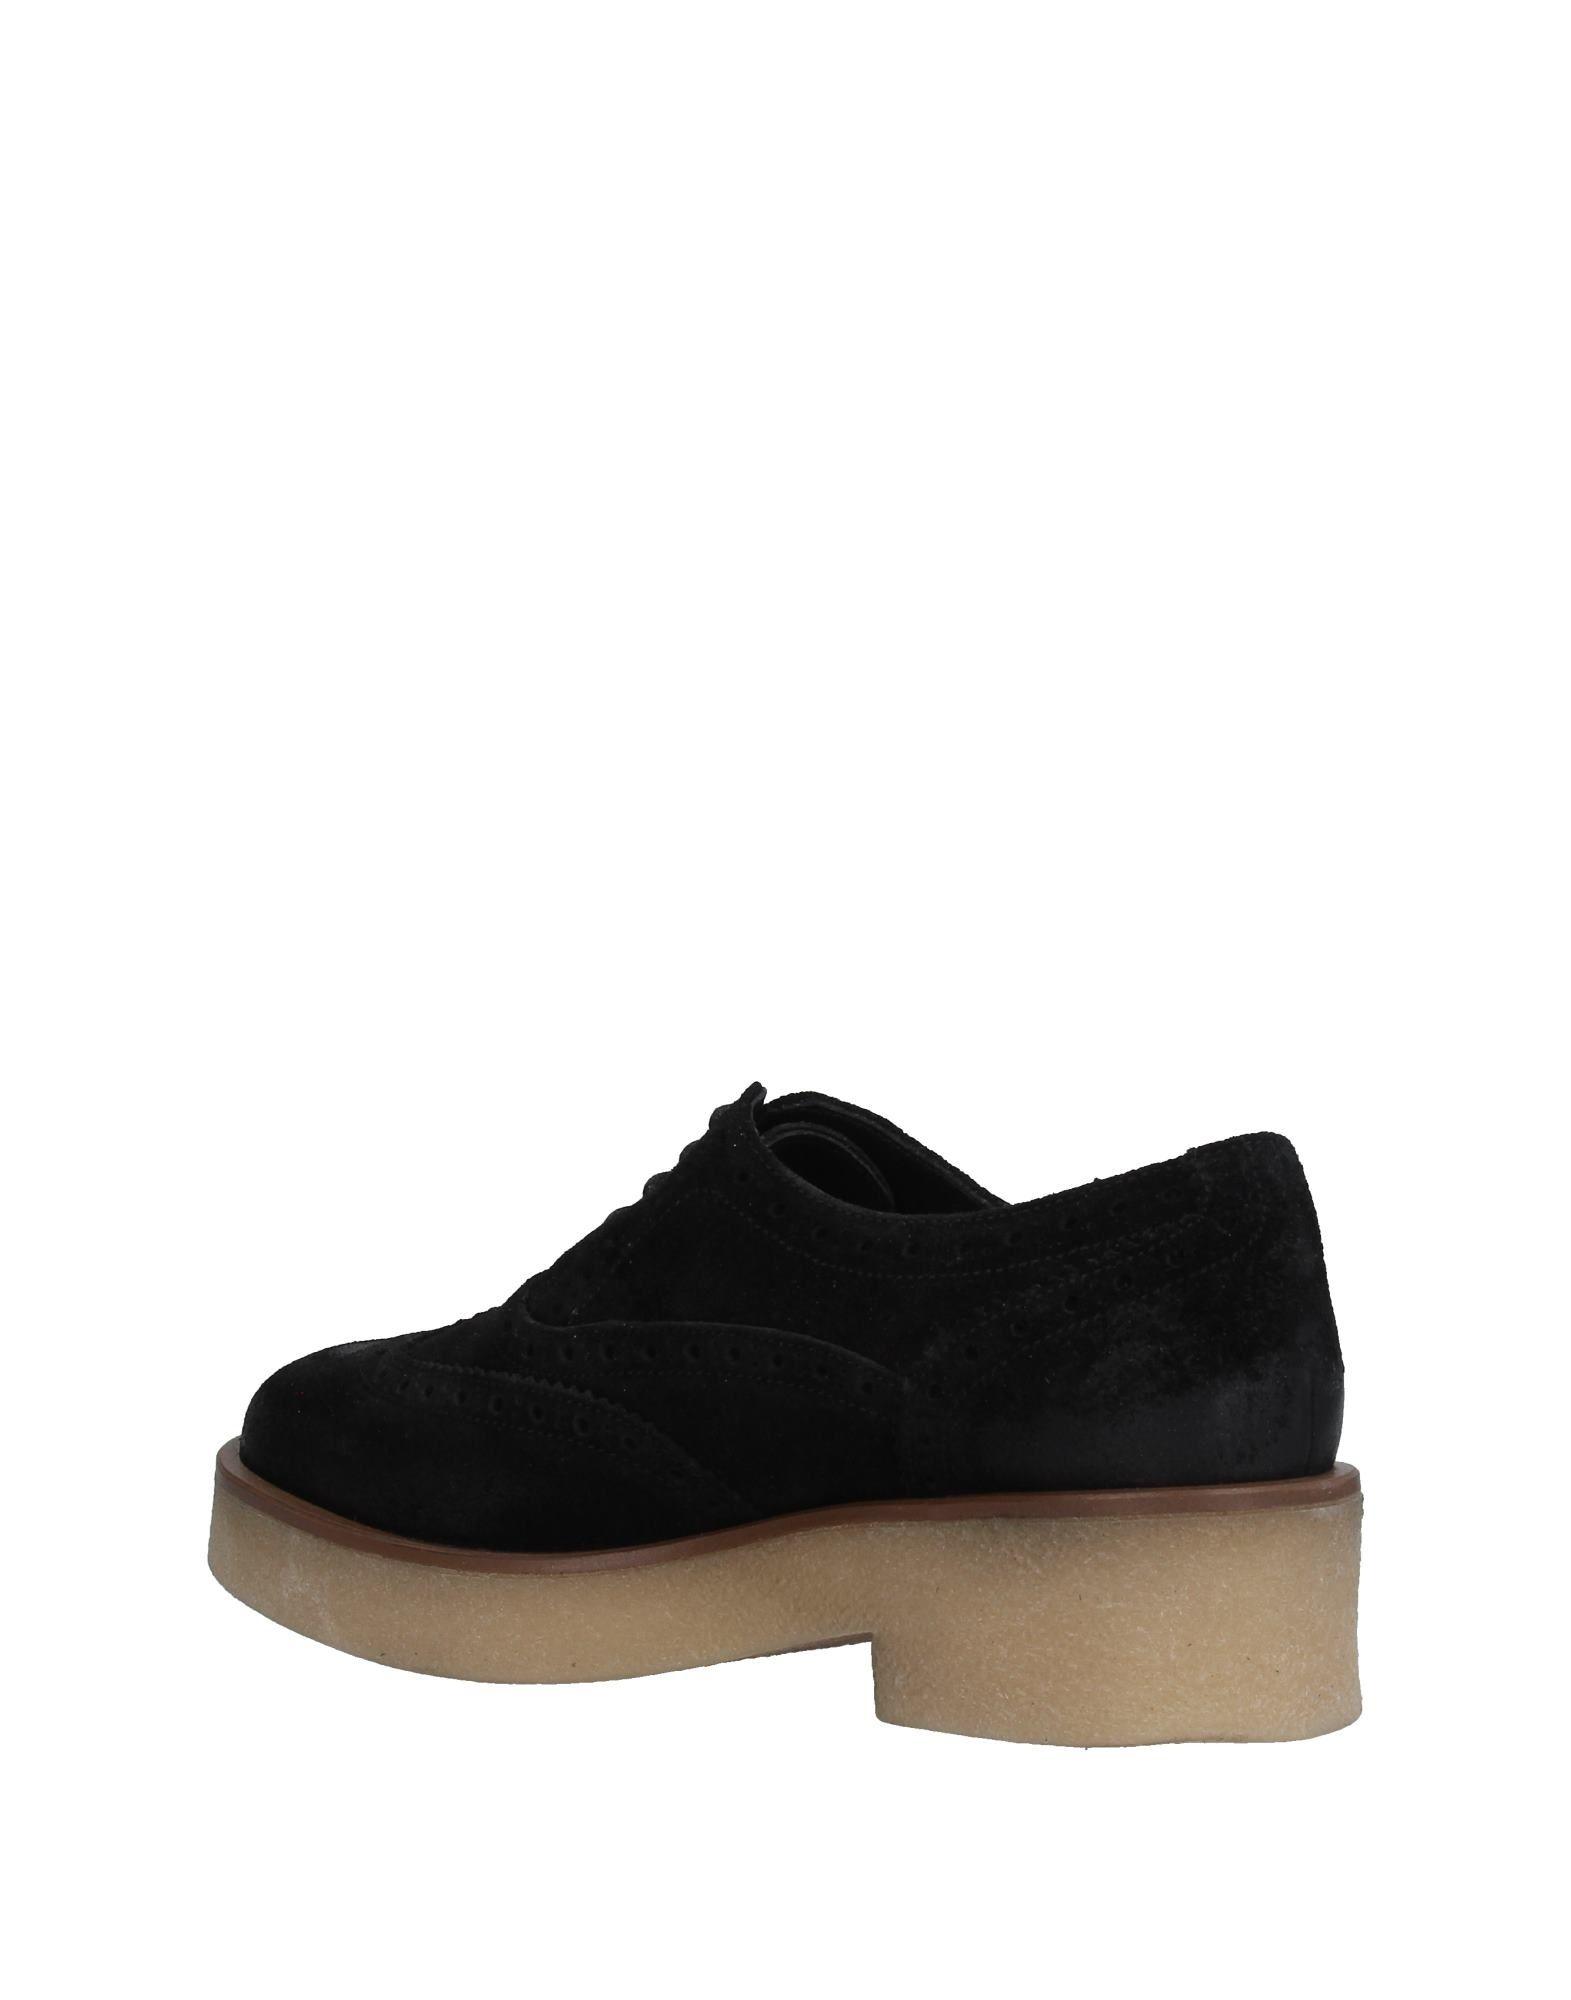 Spaziomoda Schnürschuhe Damen Qualität  11222510KA Gute Qualität Damen beliebte Schuhe 587b62